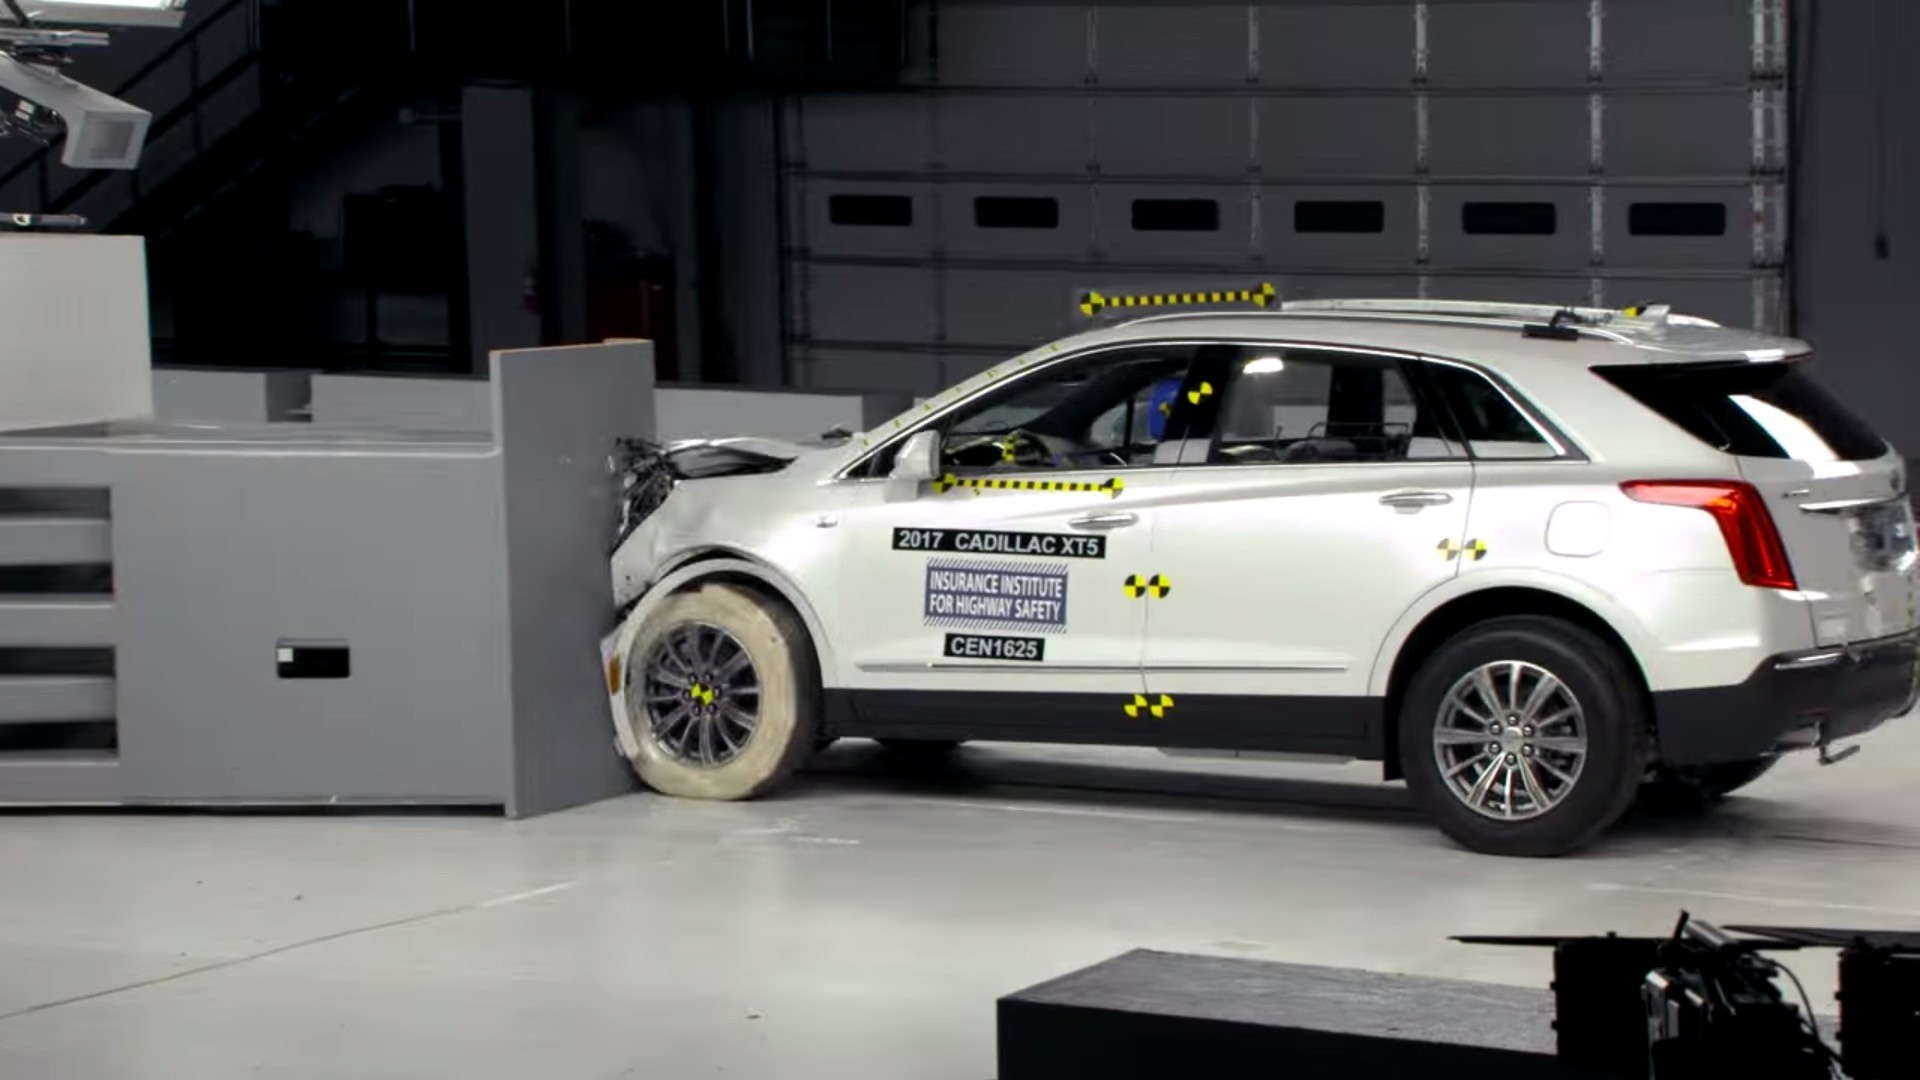 iihs crash tests cadillac xt5, rates it top safety pick+ - autoevolution